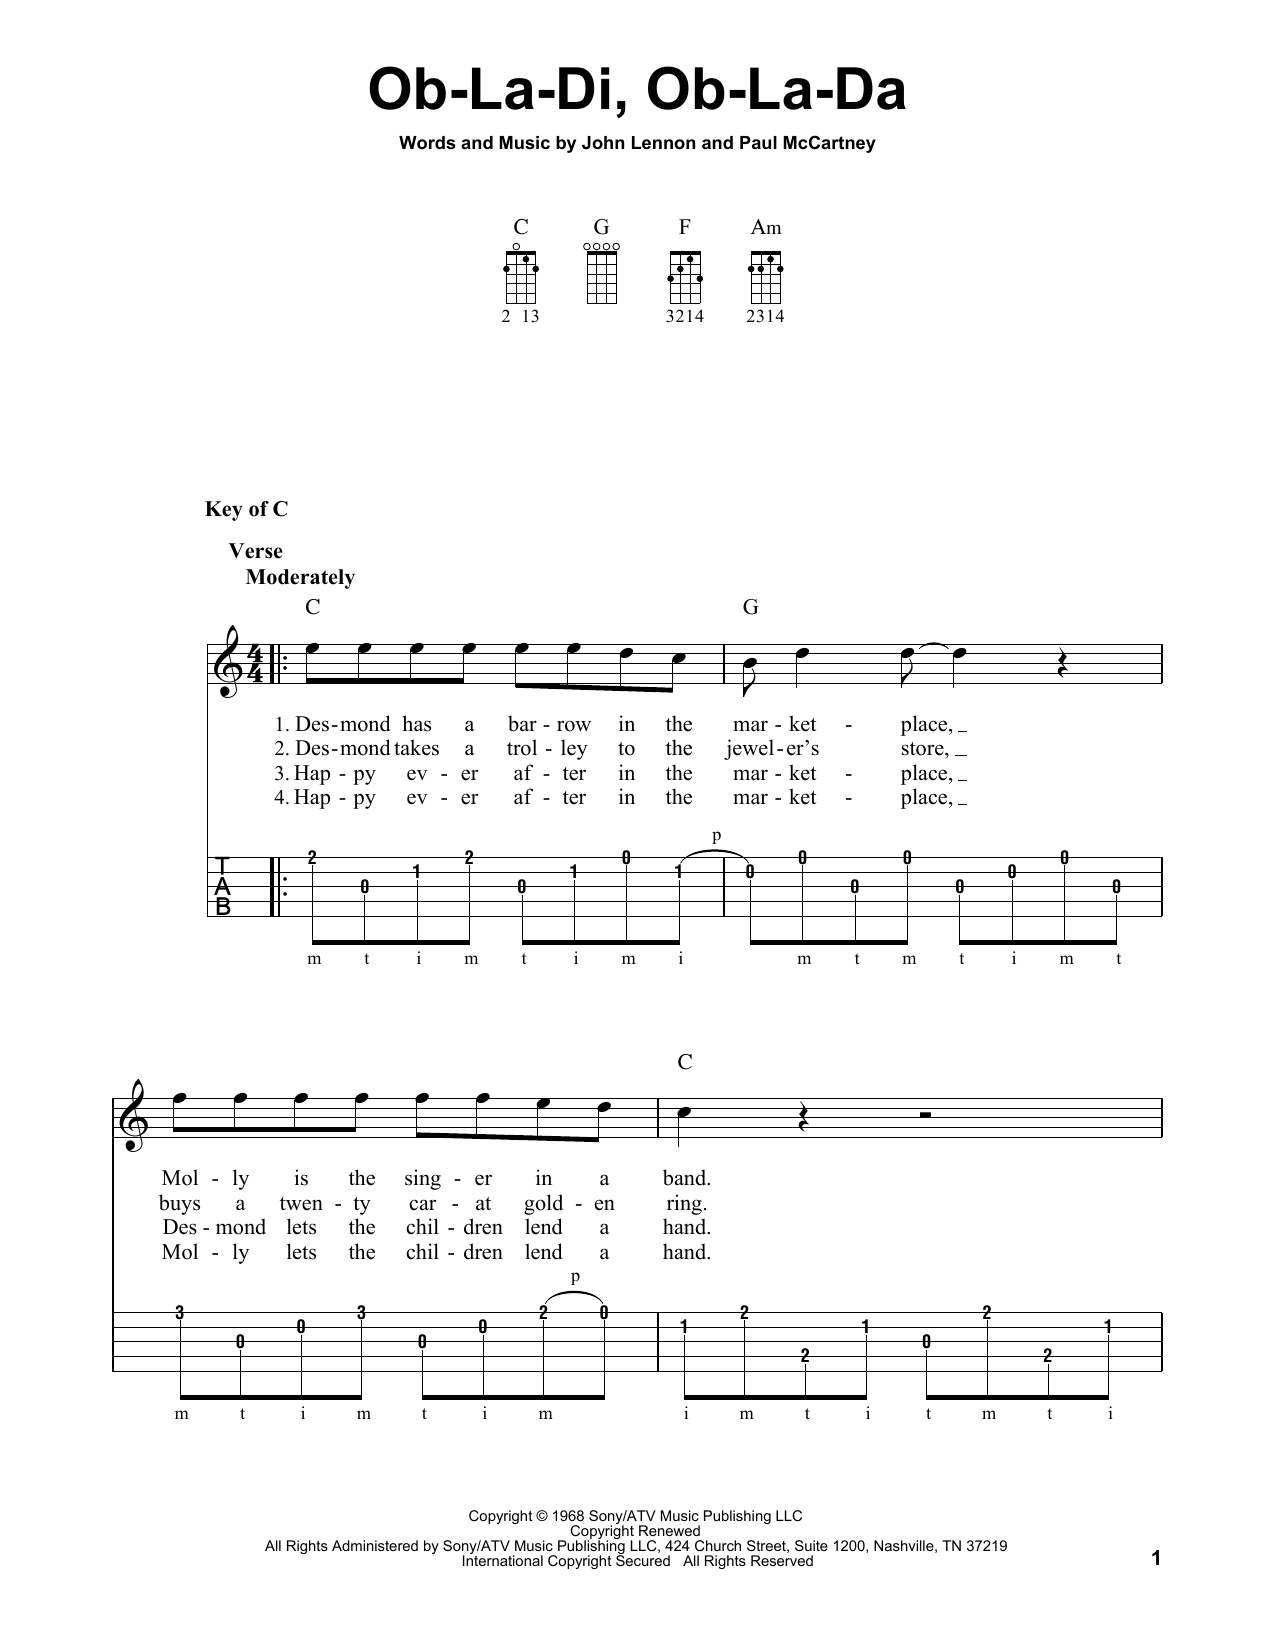 Ob-La-Di, Ob-La-Da (Banjo Tab)